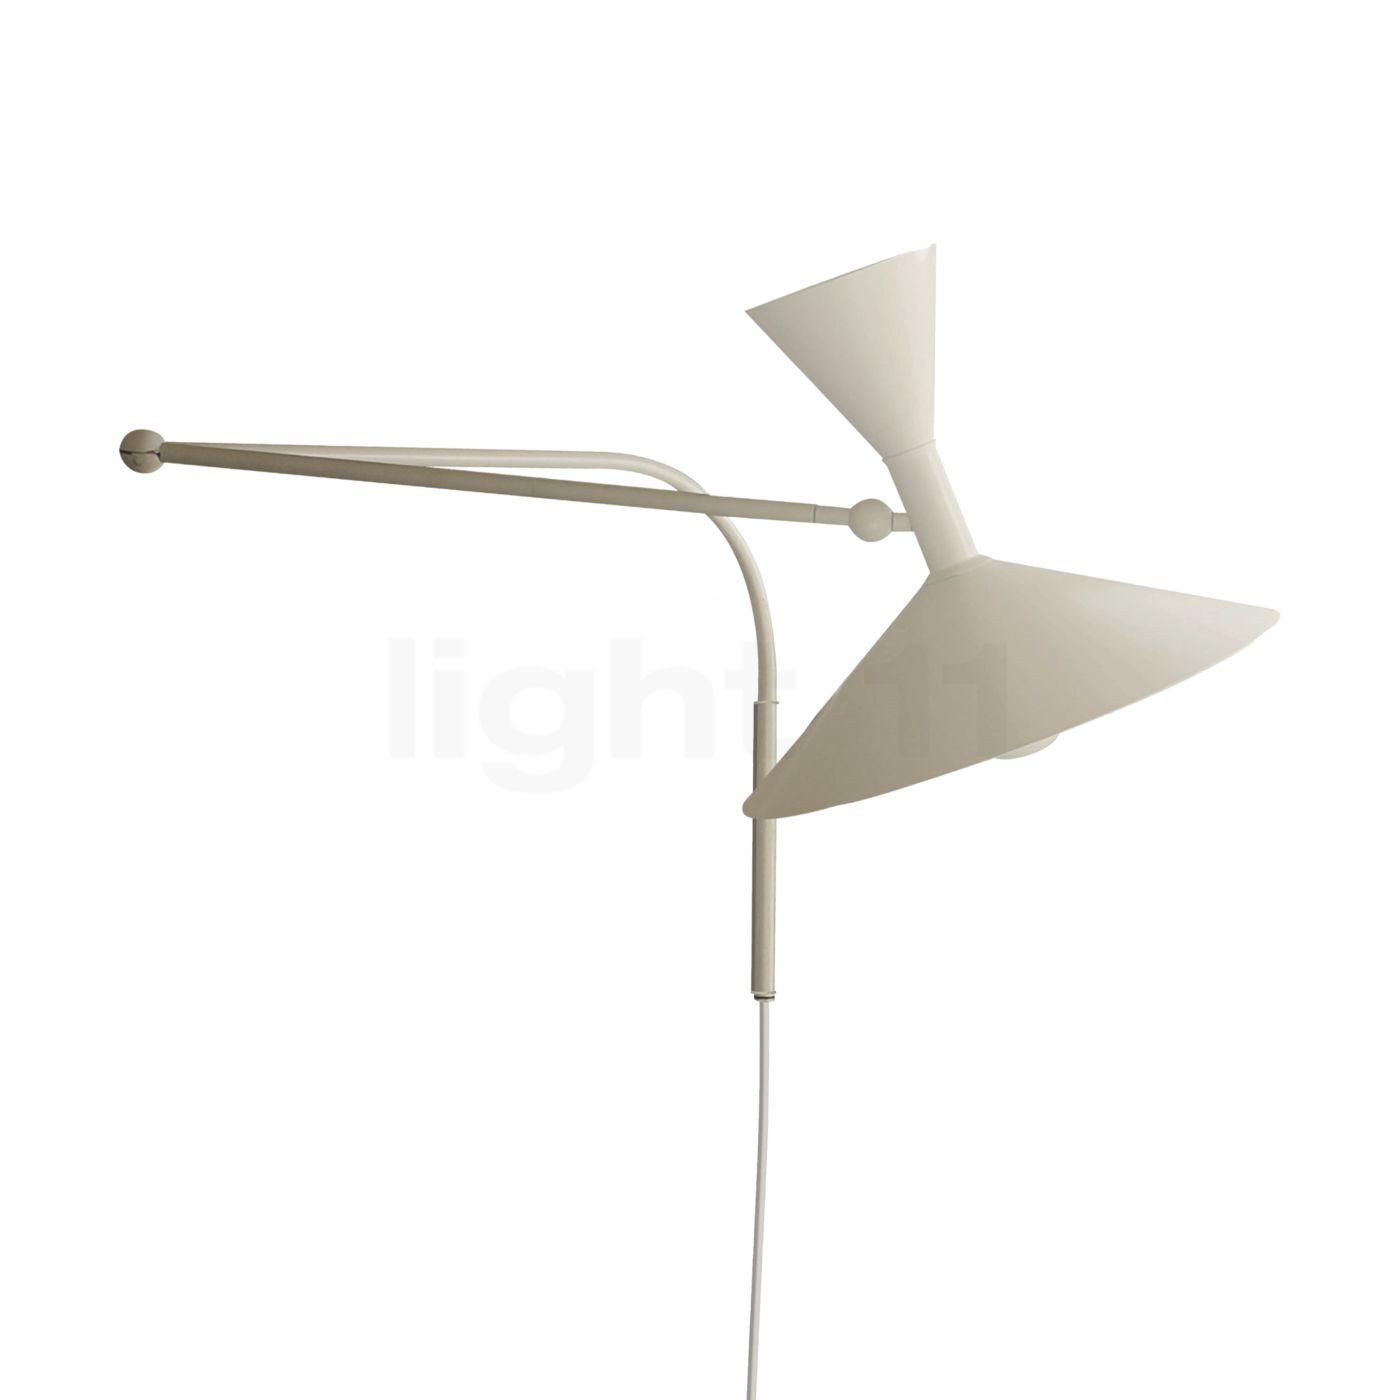 Nemo lampe de marseille reading lights buy at - Lampe de marseille le corbusier ...